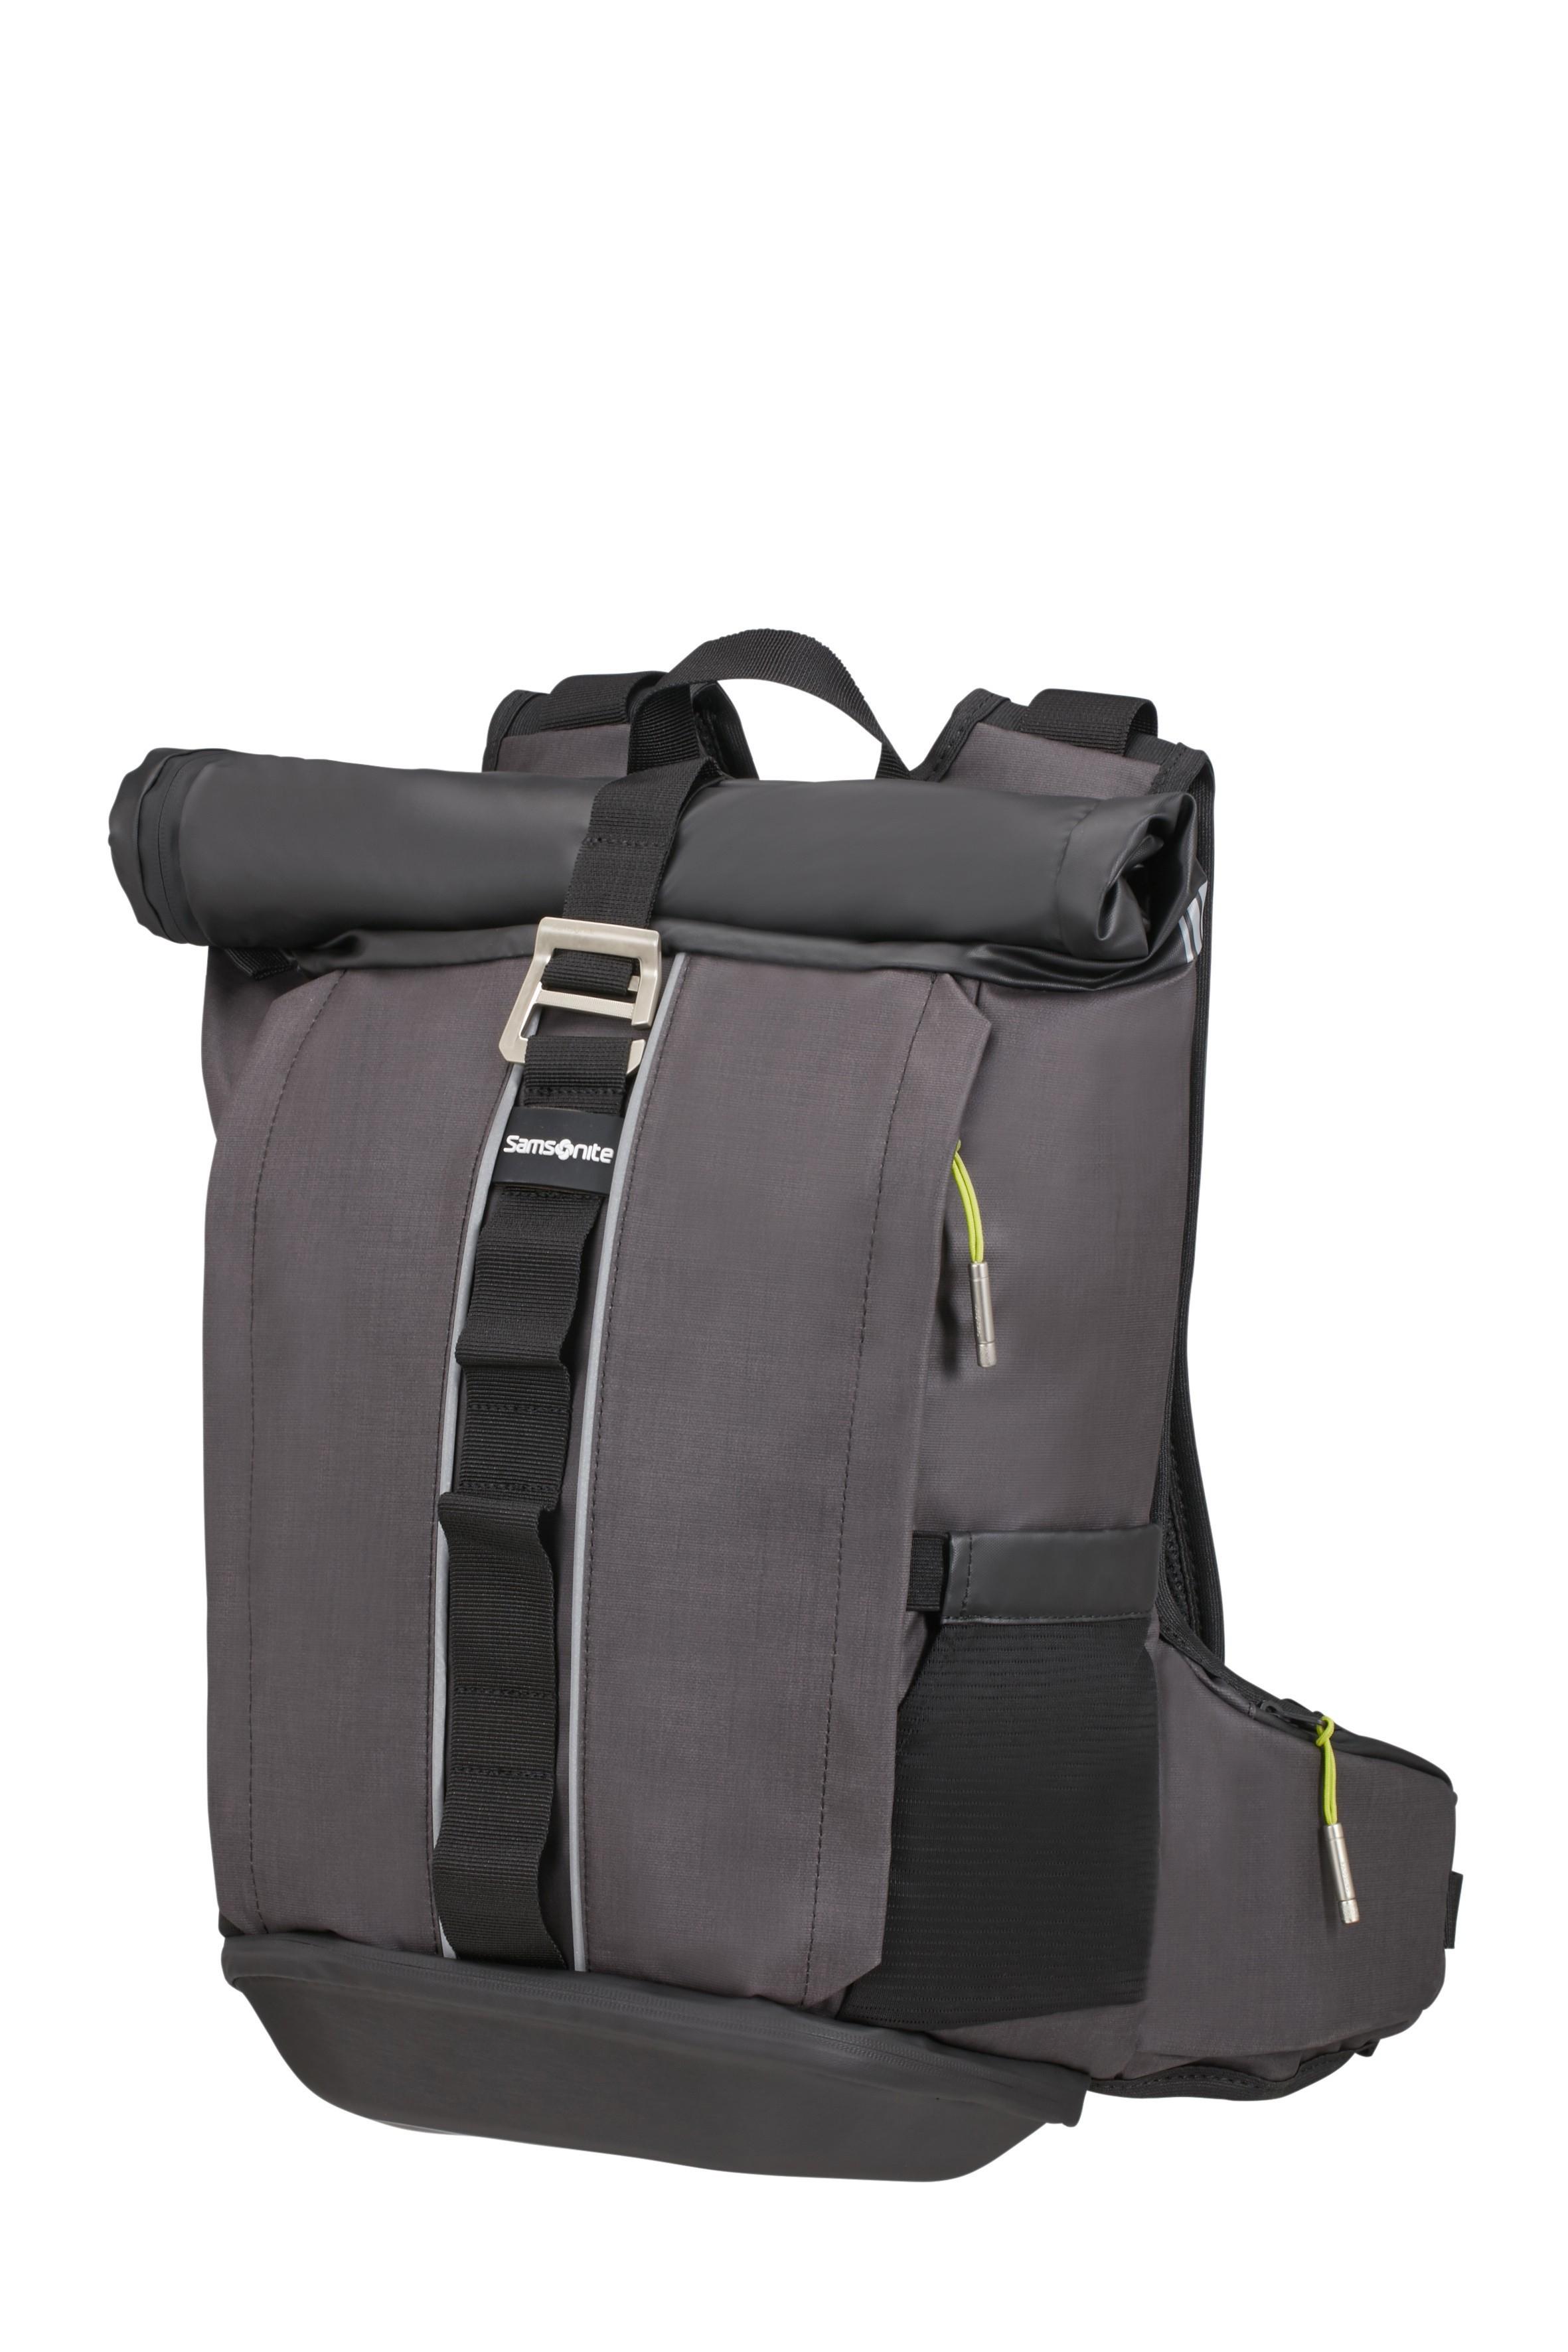 7d695eb7ff43 Samsonite 2WM Laptop Backpack R Top 15.6'' black - Taska lederwaren